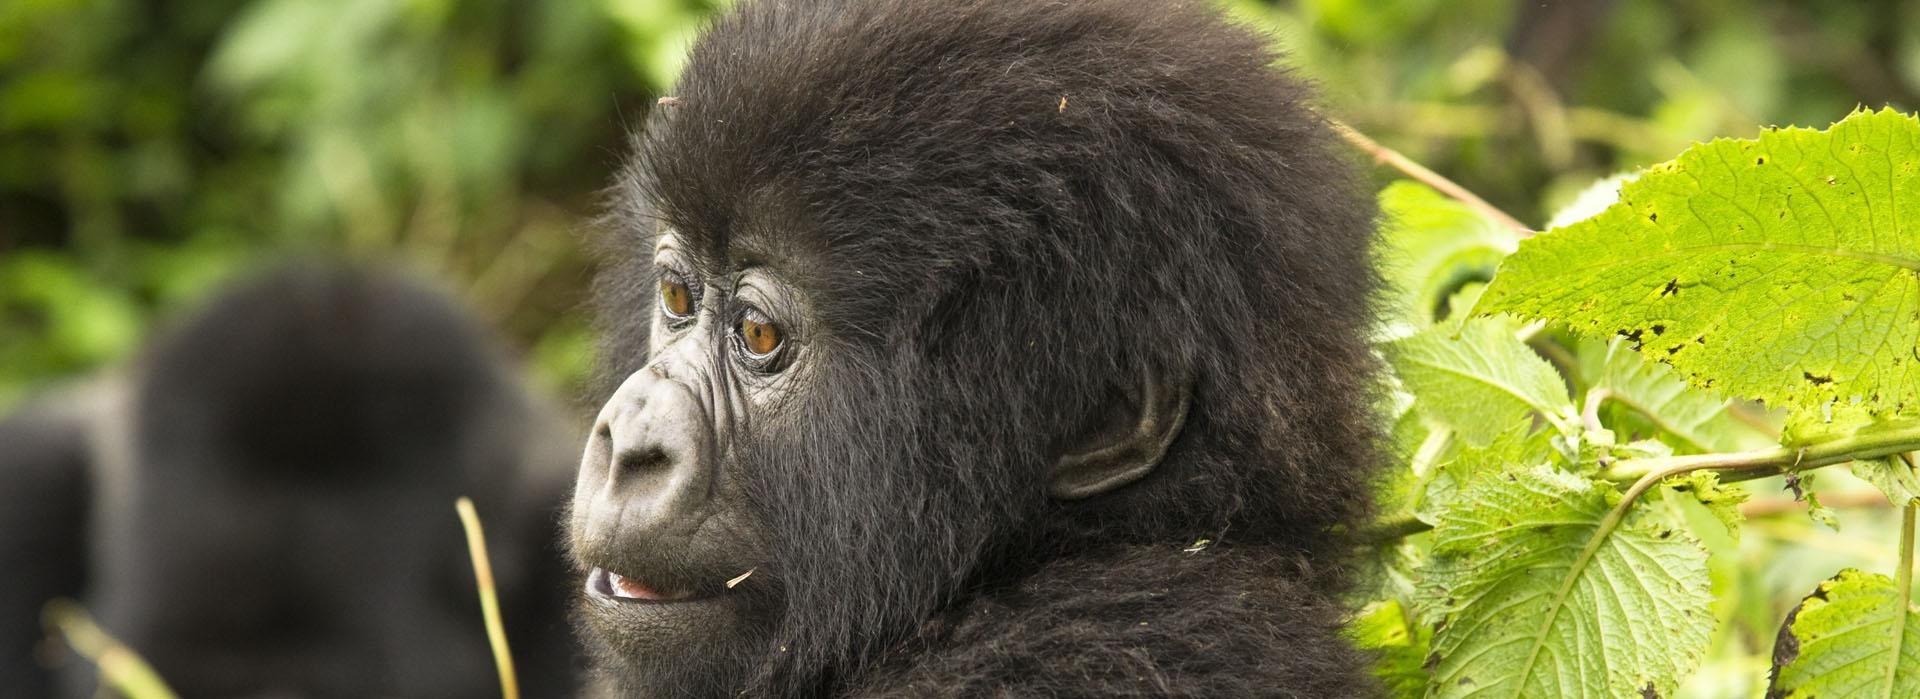 Uganda Gorilla Tours from South Africa